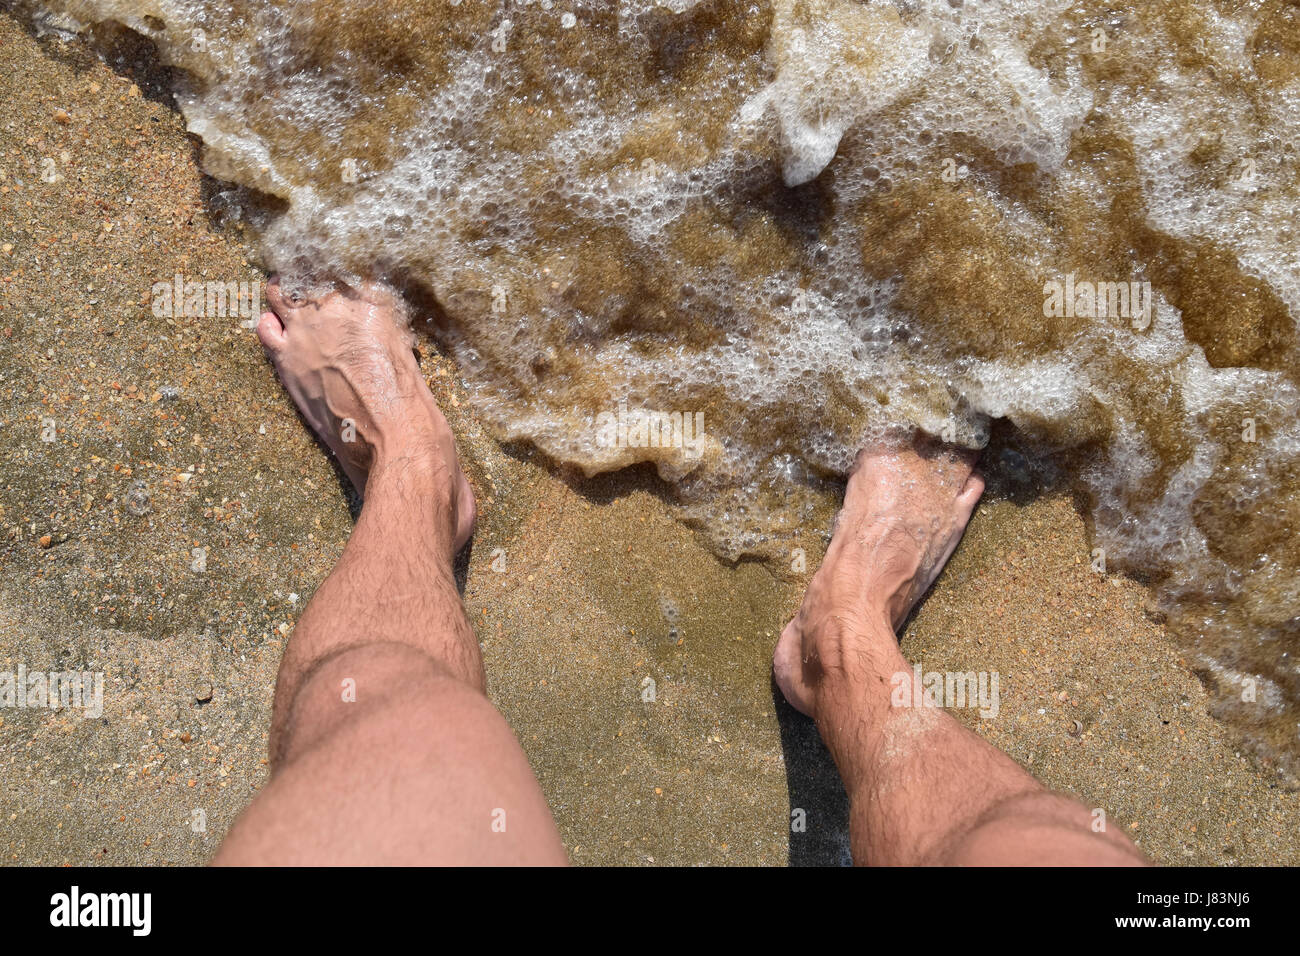 For Hairy men walking beach